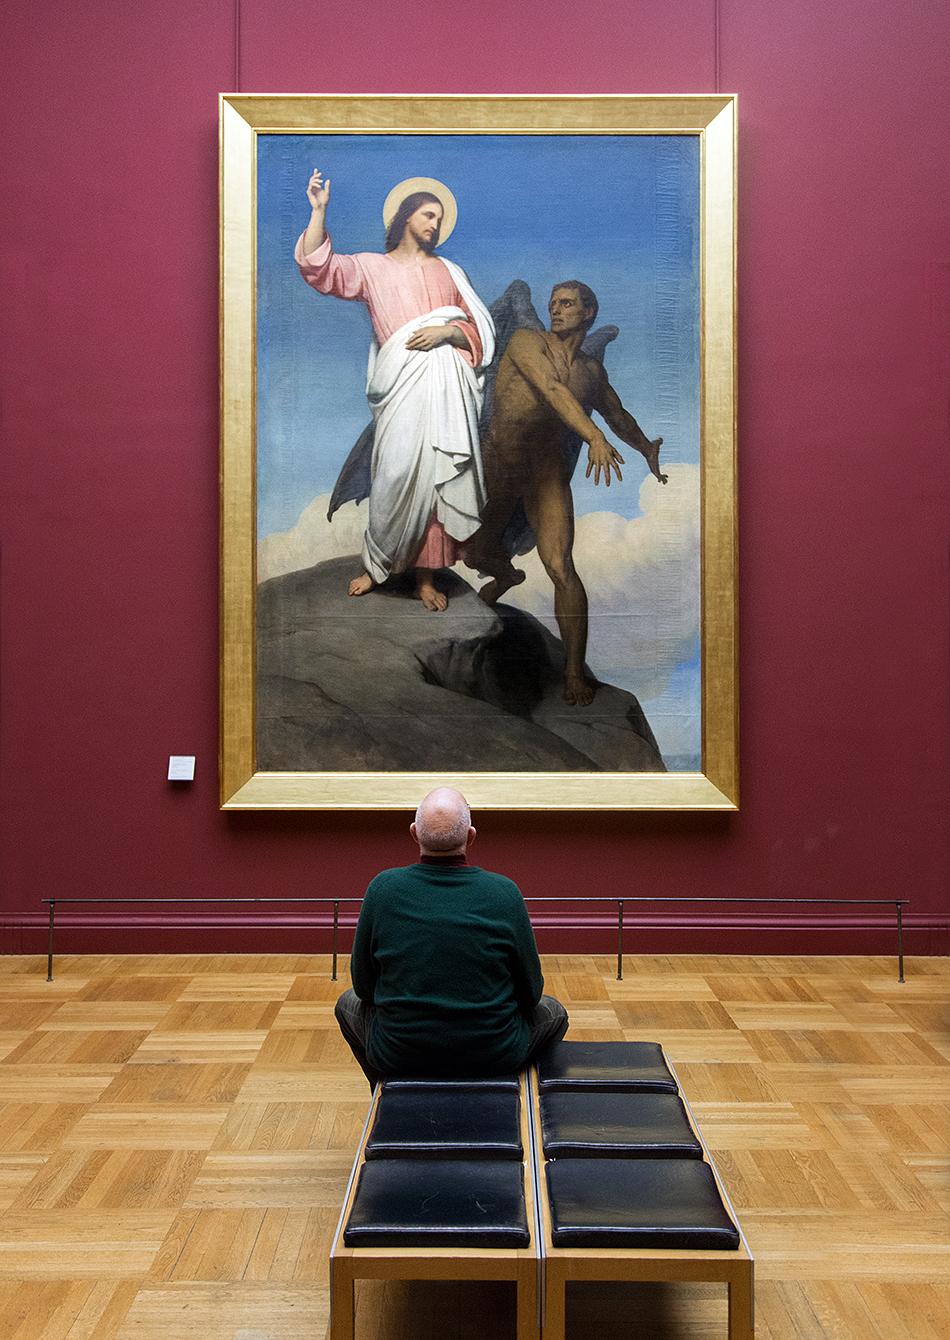 Fabian Fröhlich, Louvre, Ary Scheffer, La tentation du Christ